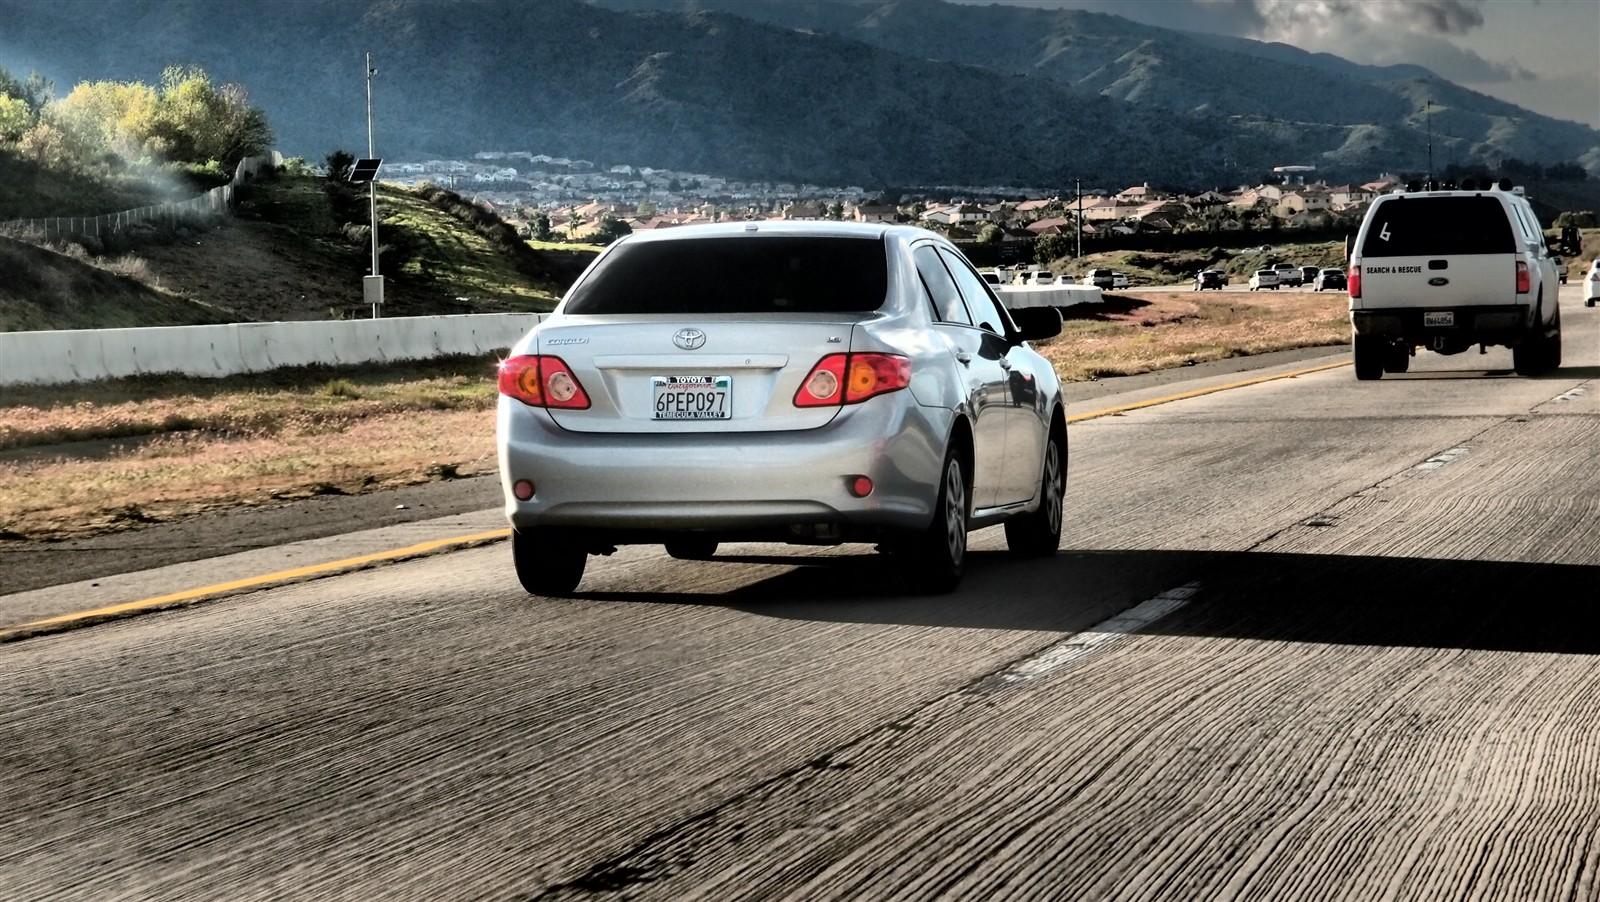 「car highway」の画像検索結果